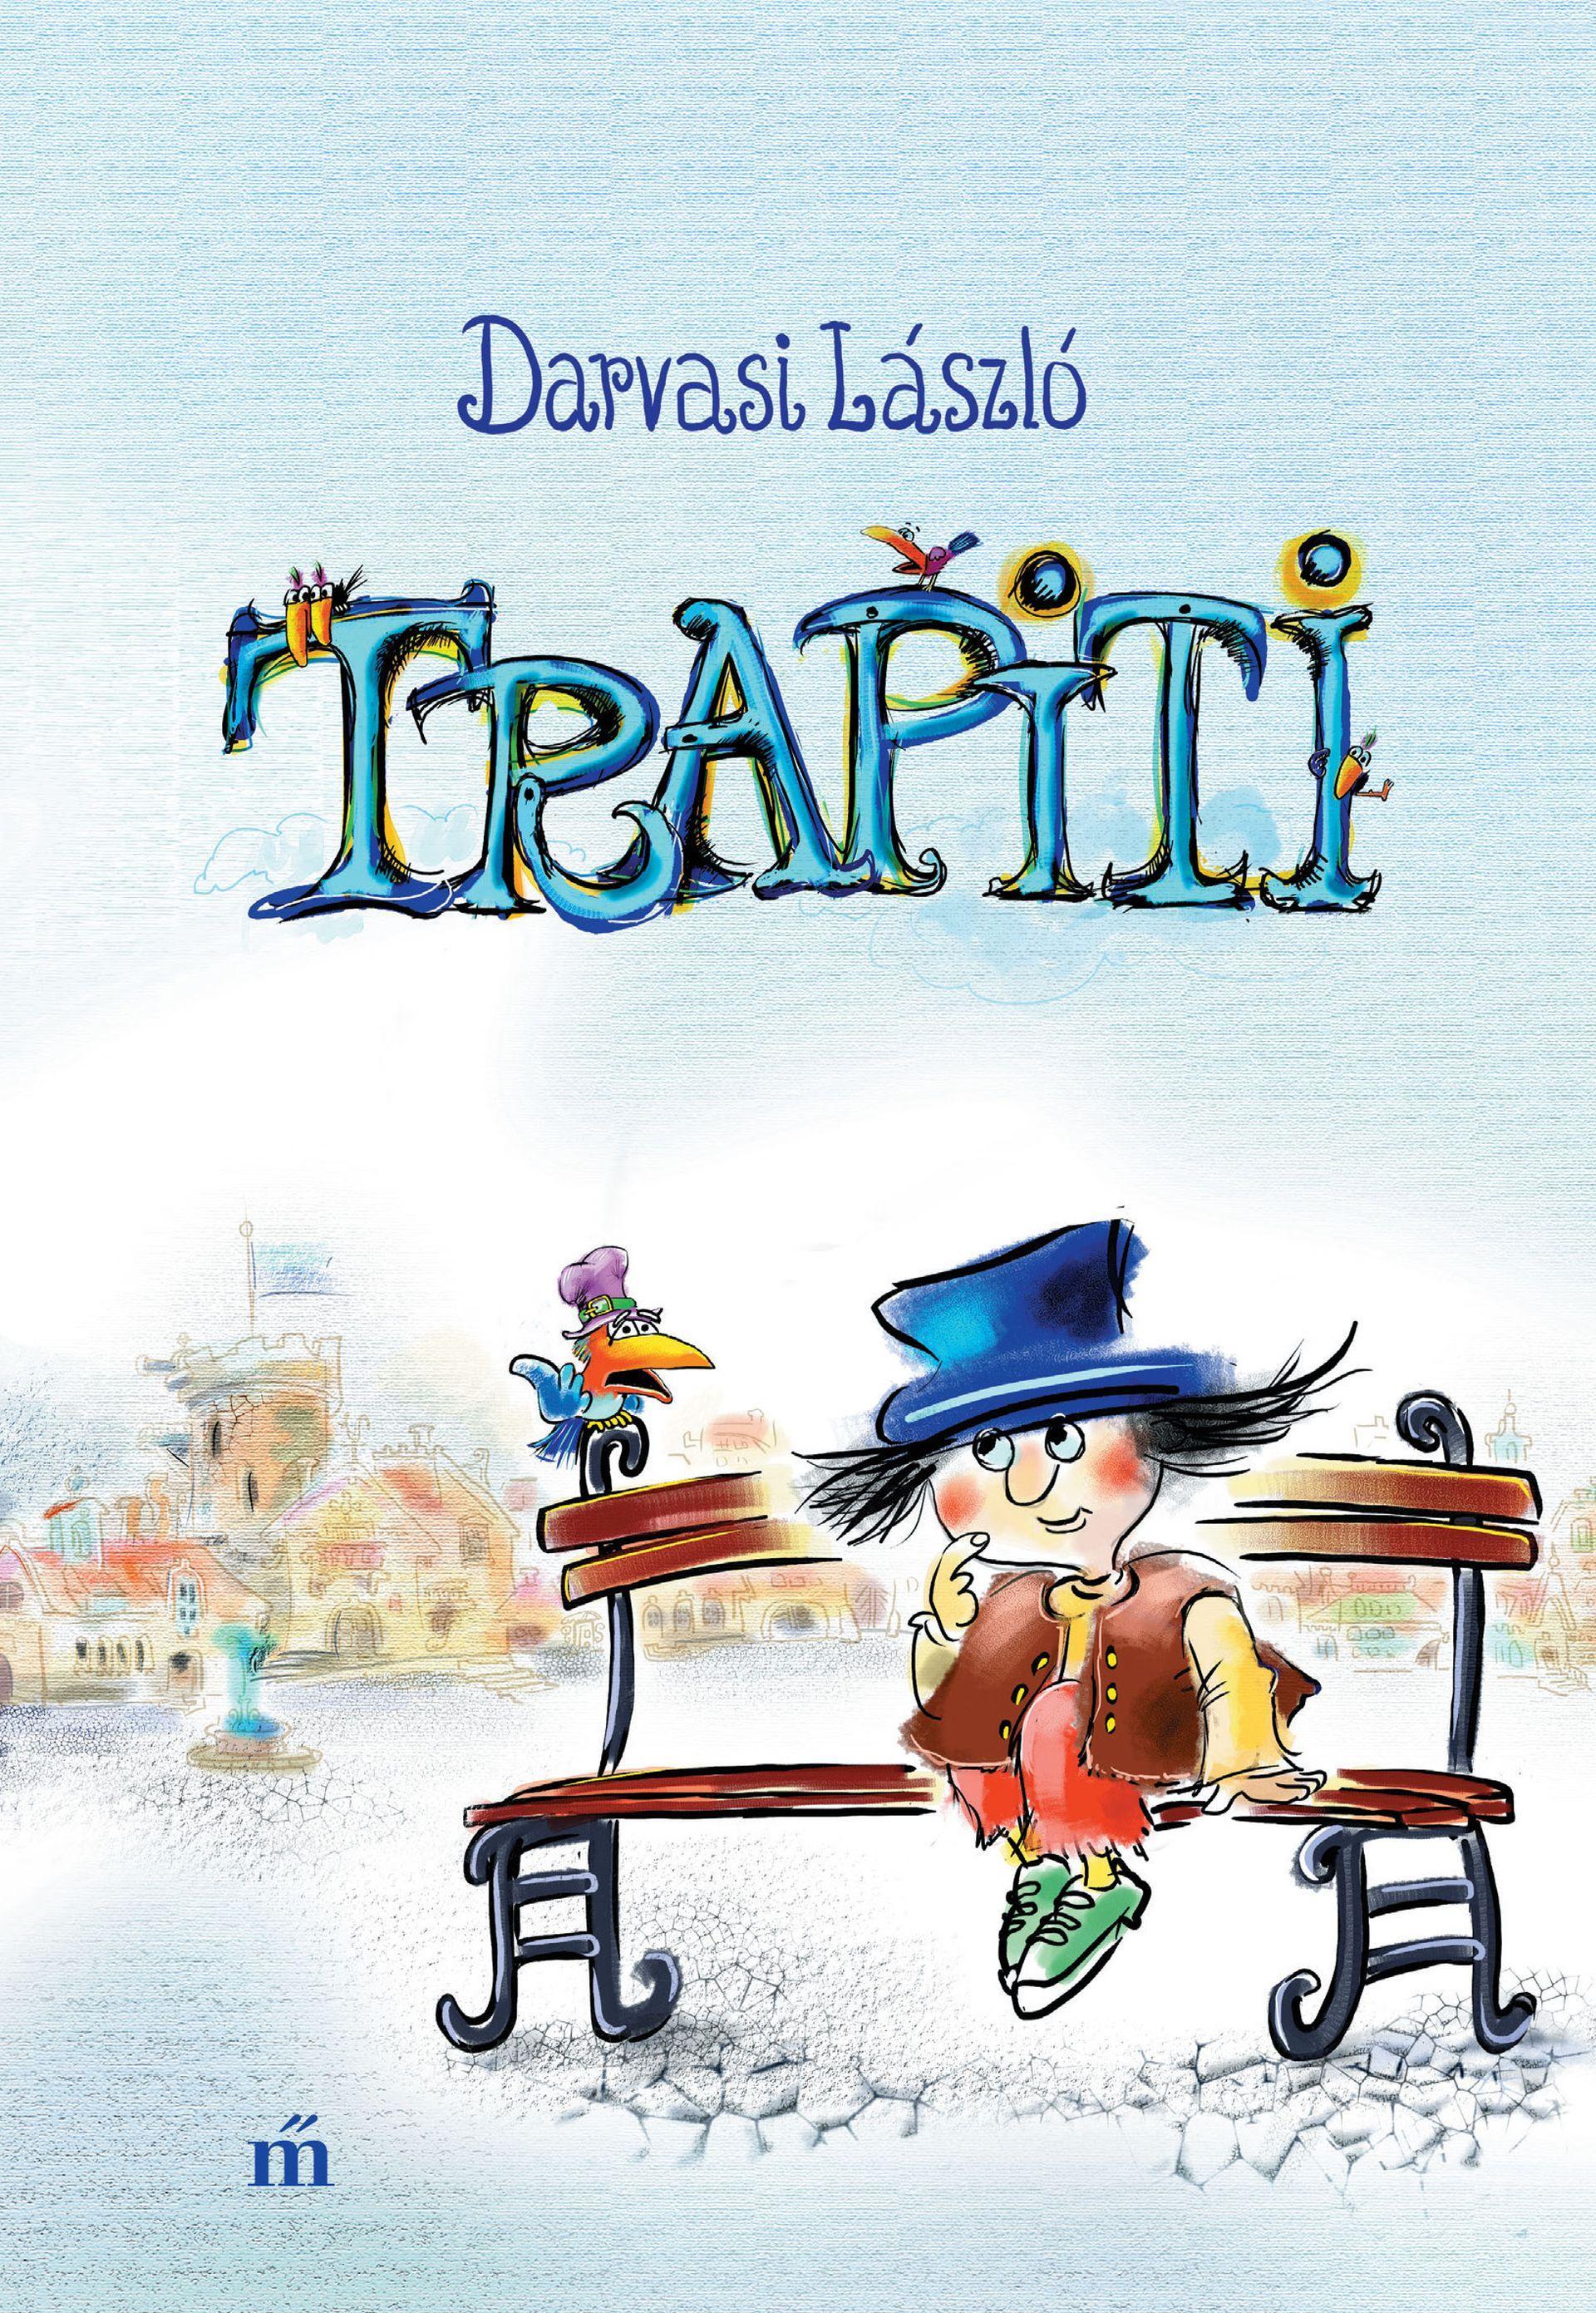 Darvasi László - Trapiti